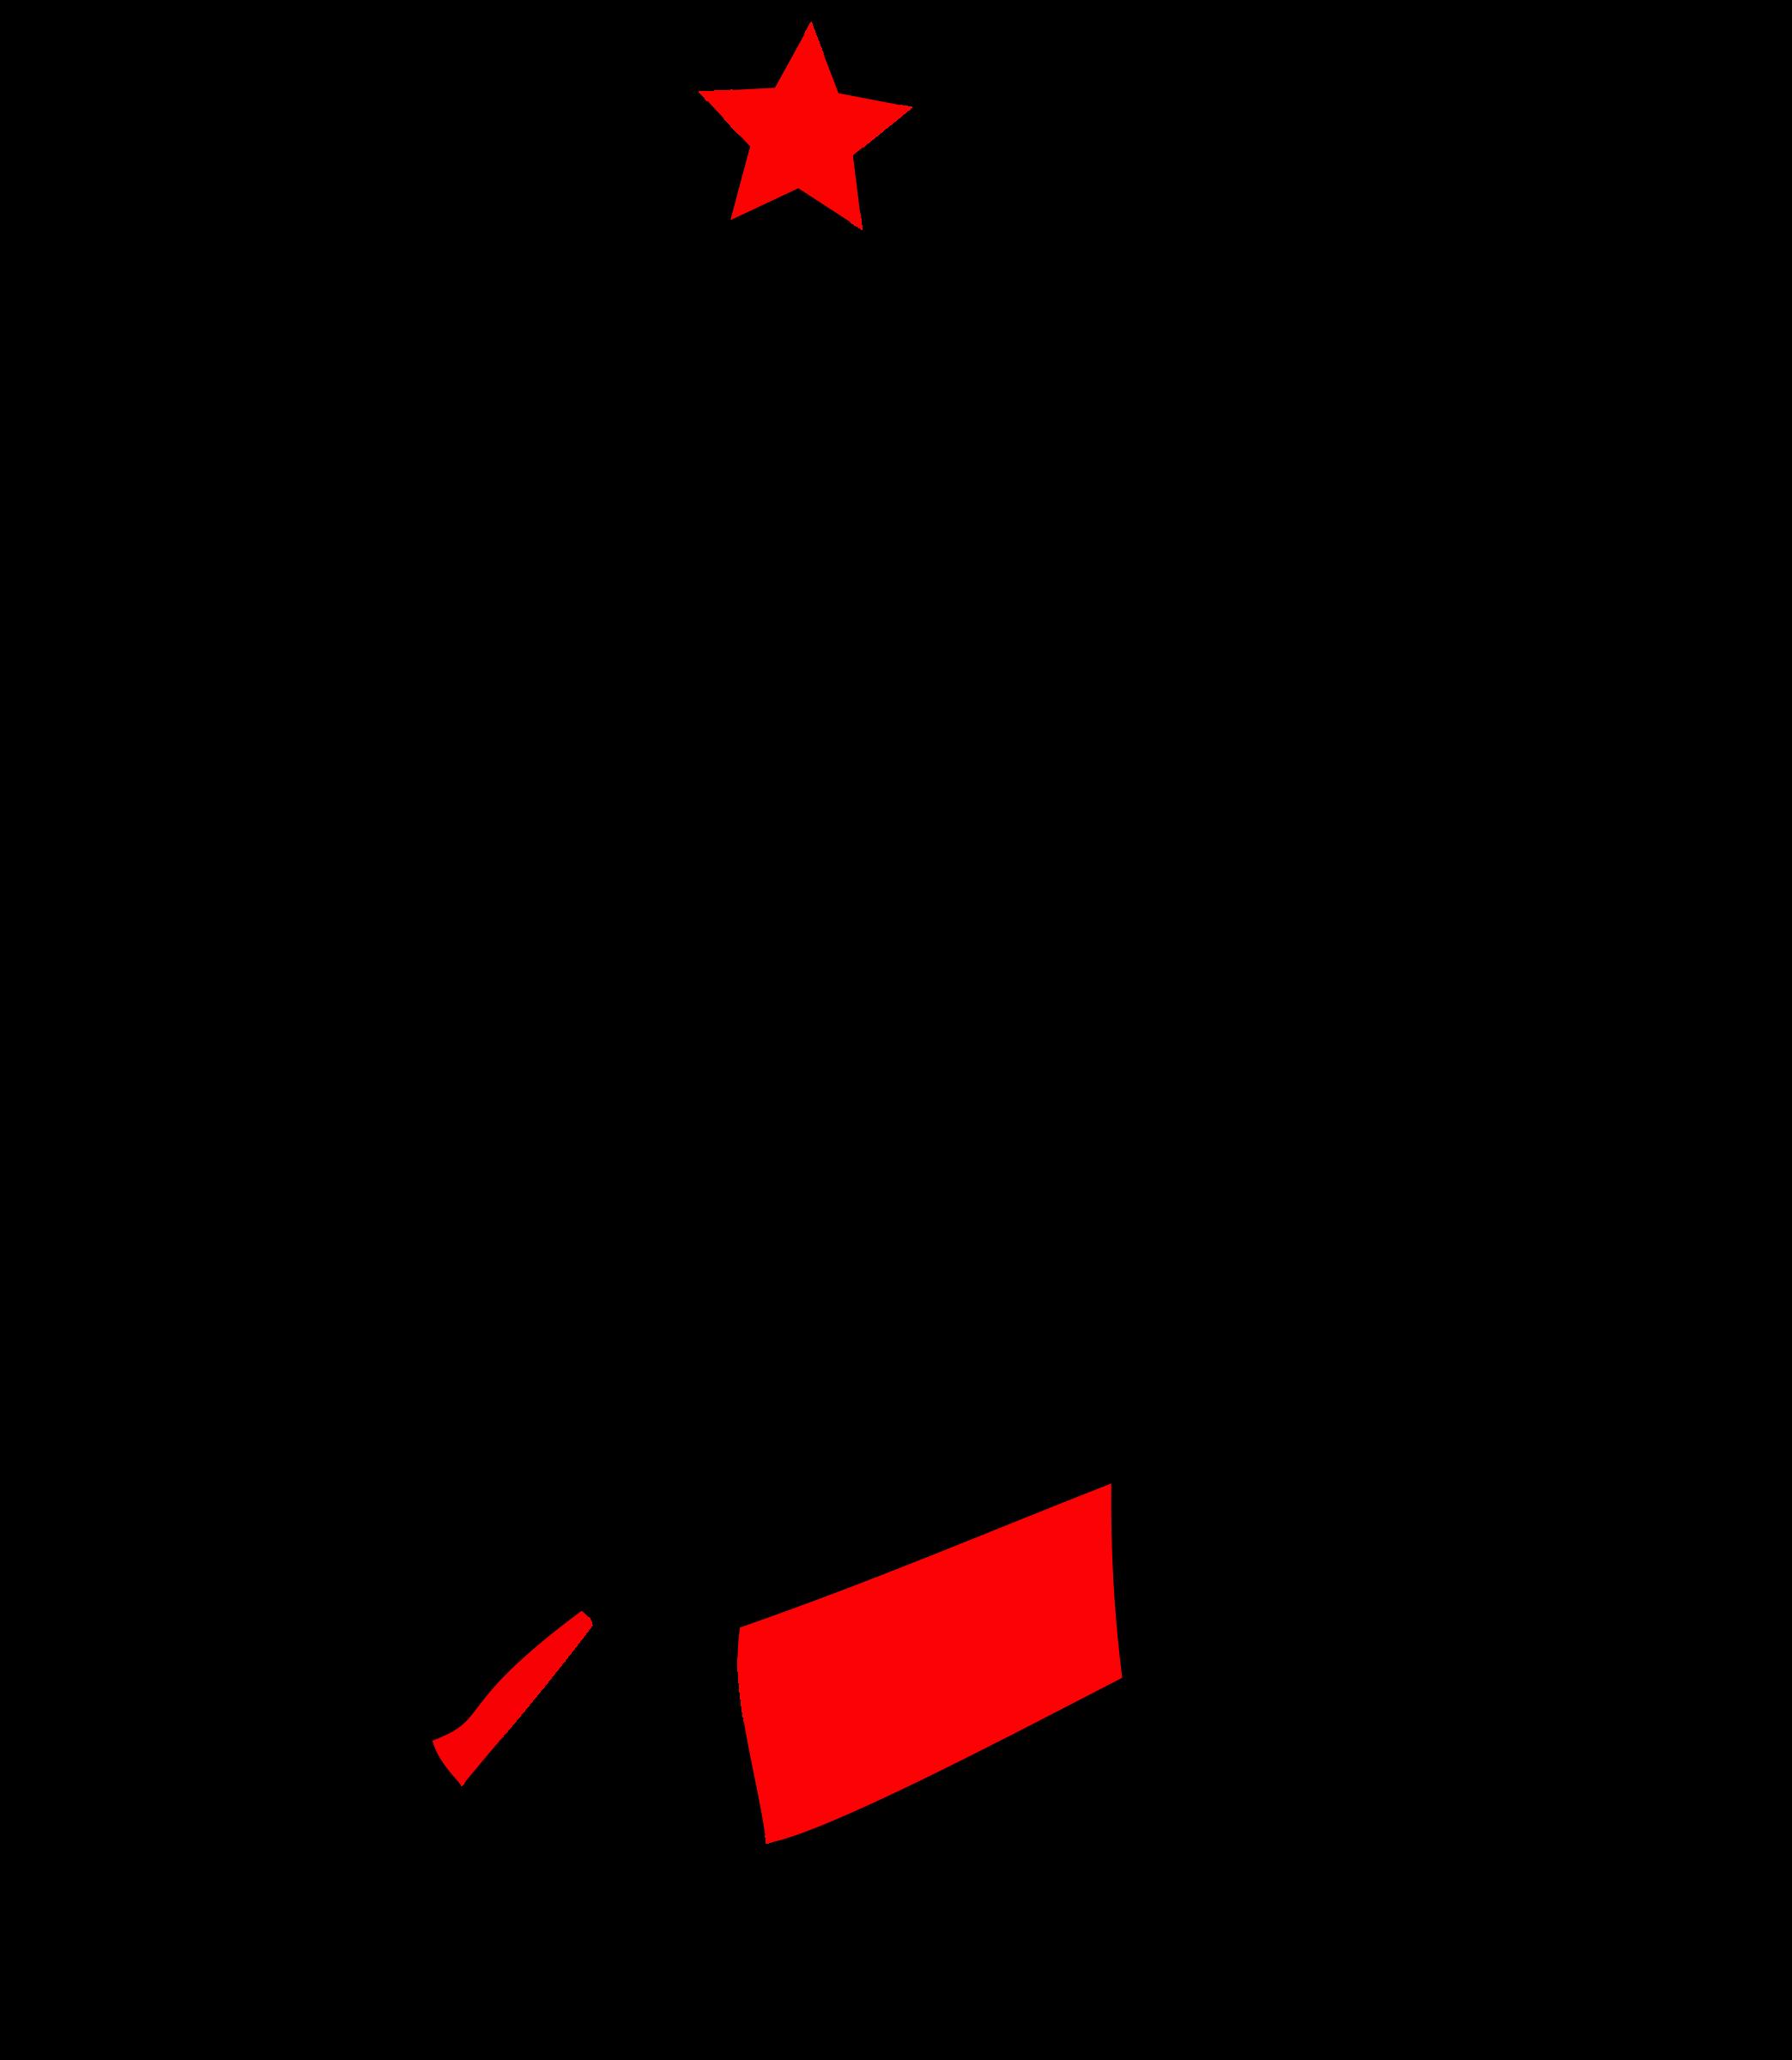 Chairman group mao zedong. History clipart revolutionary